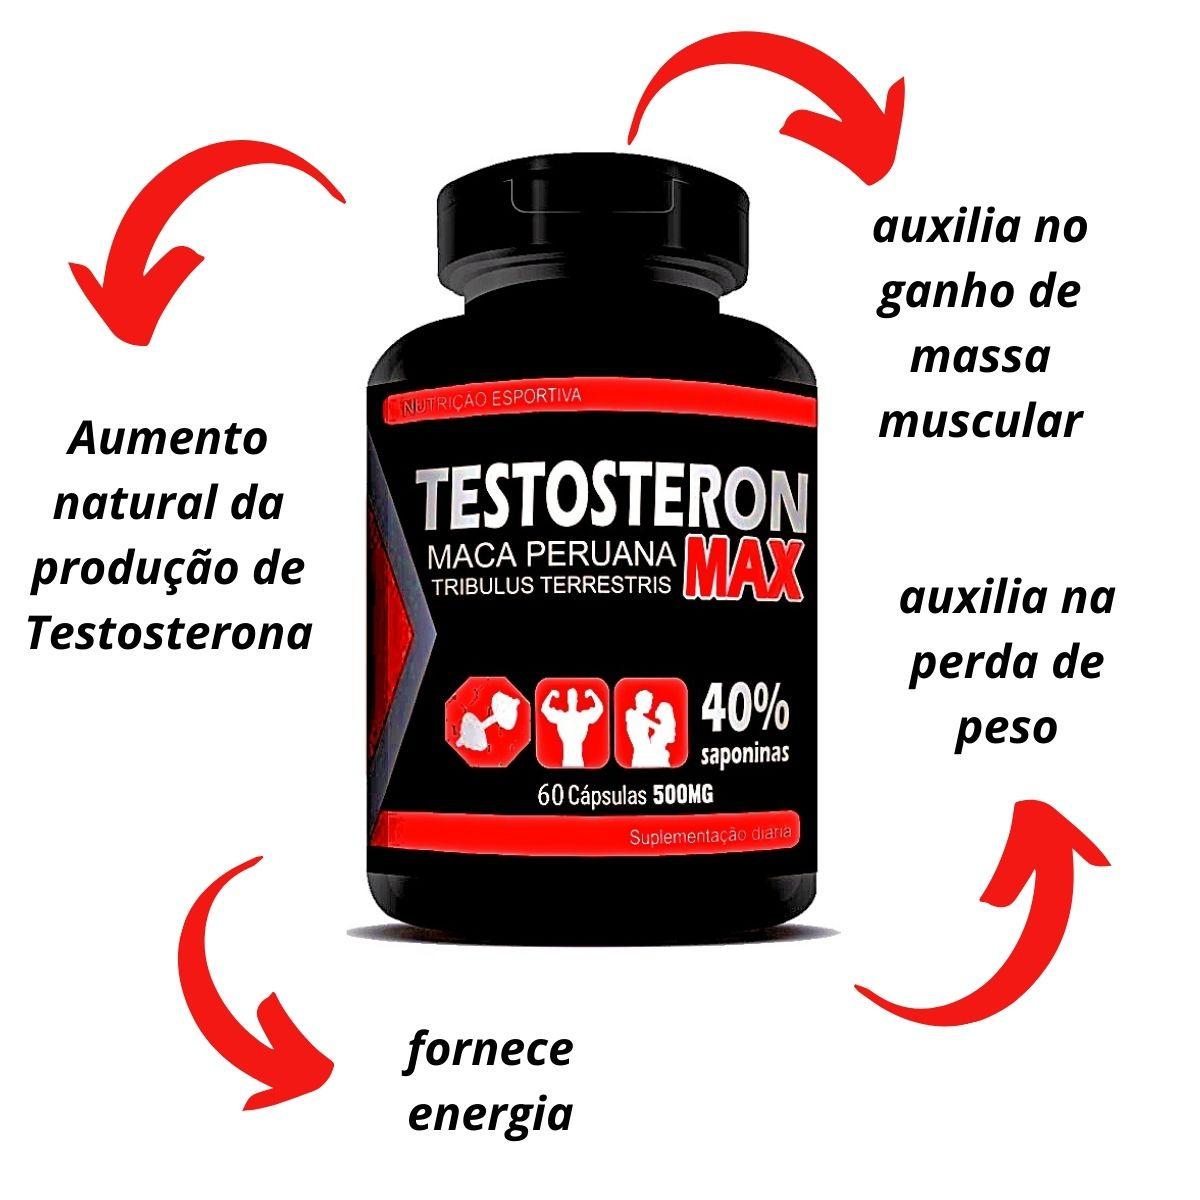 Testosteron max maca peruana 60caps 500mg - rn suplementos